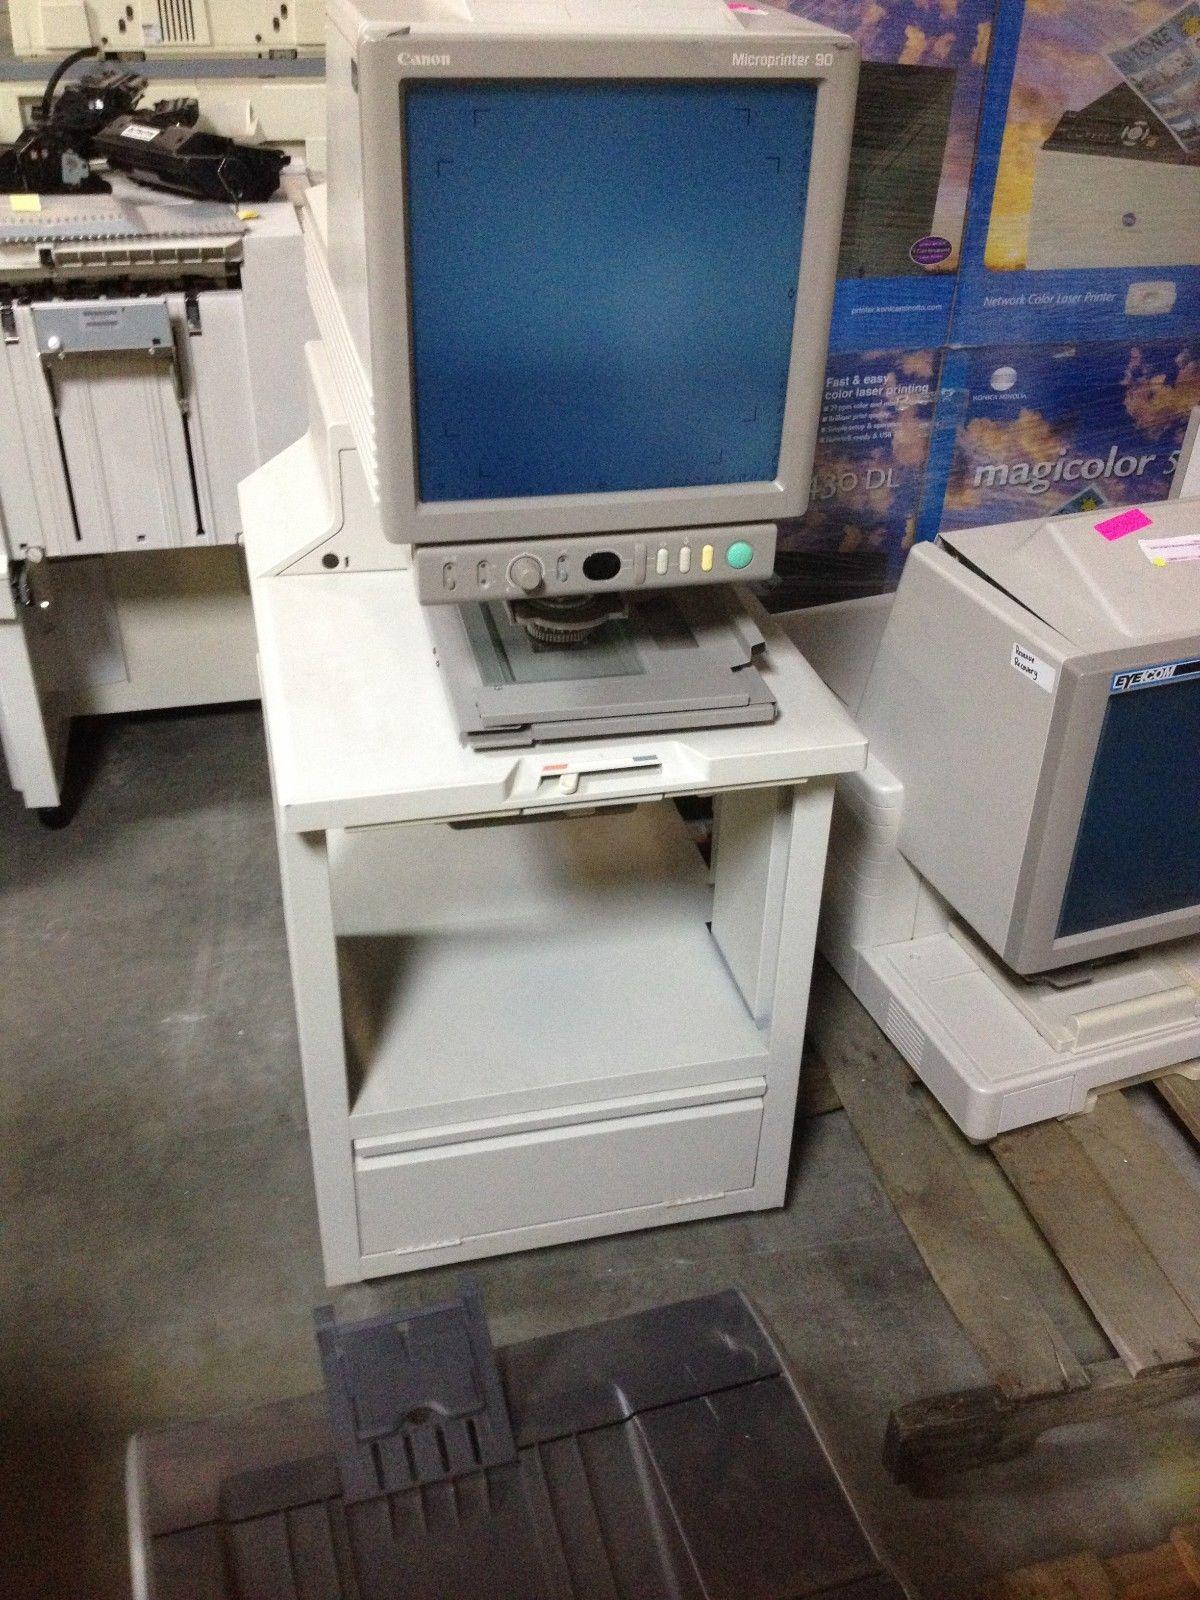 personalcomputer von canon